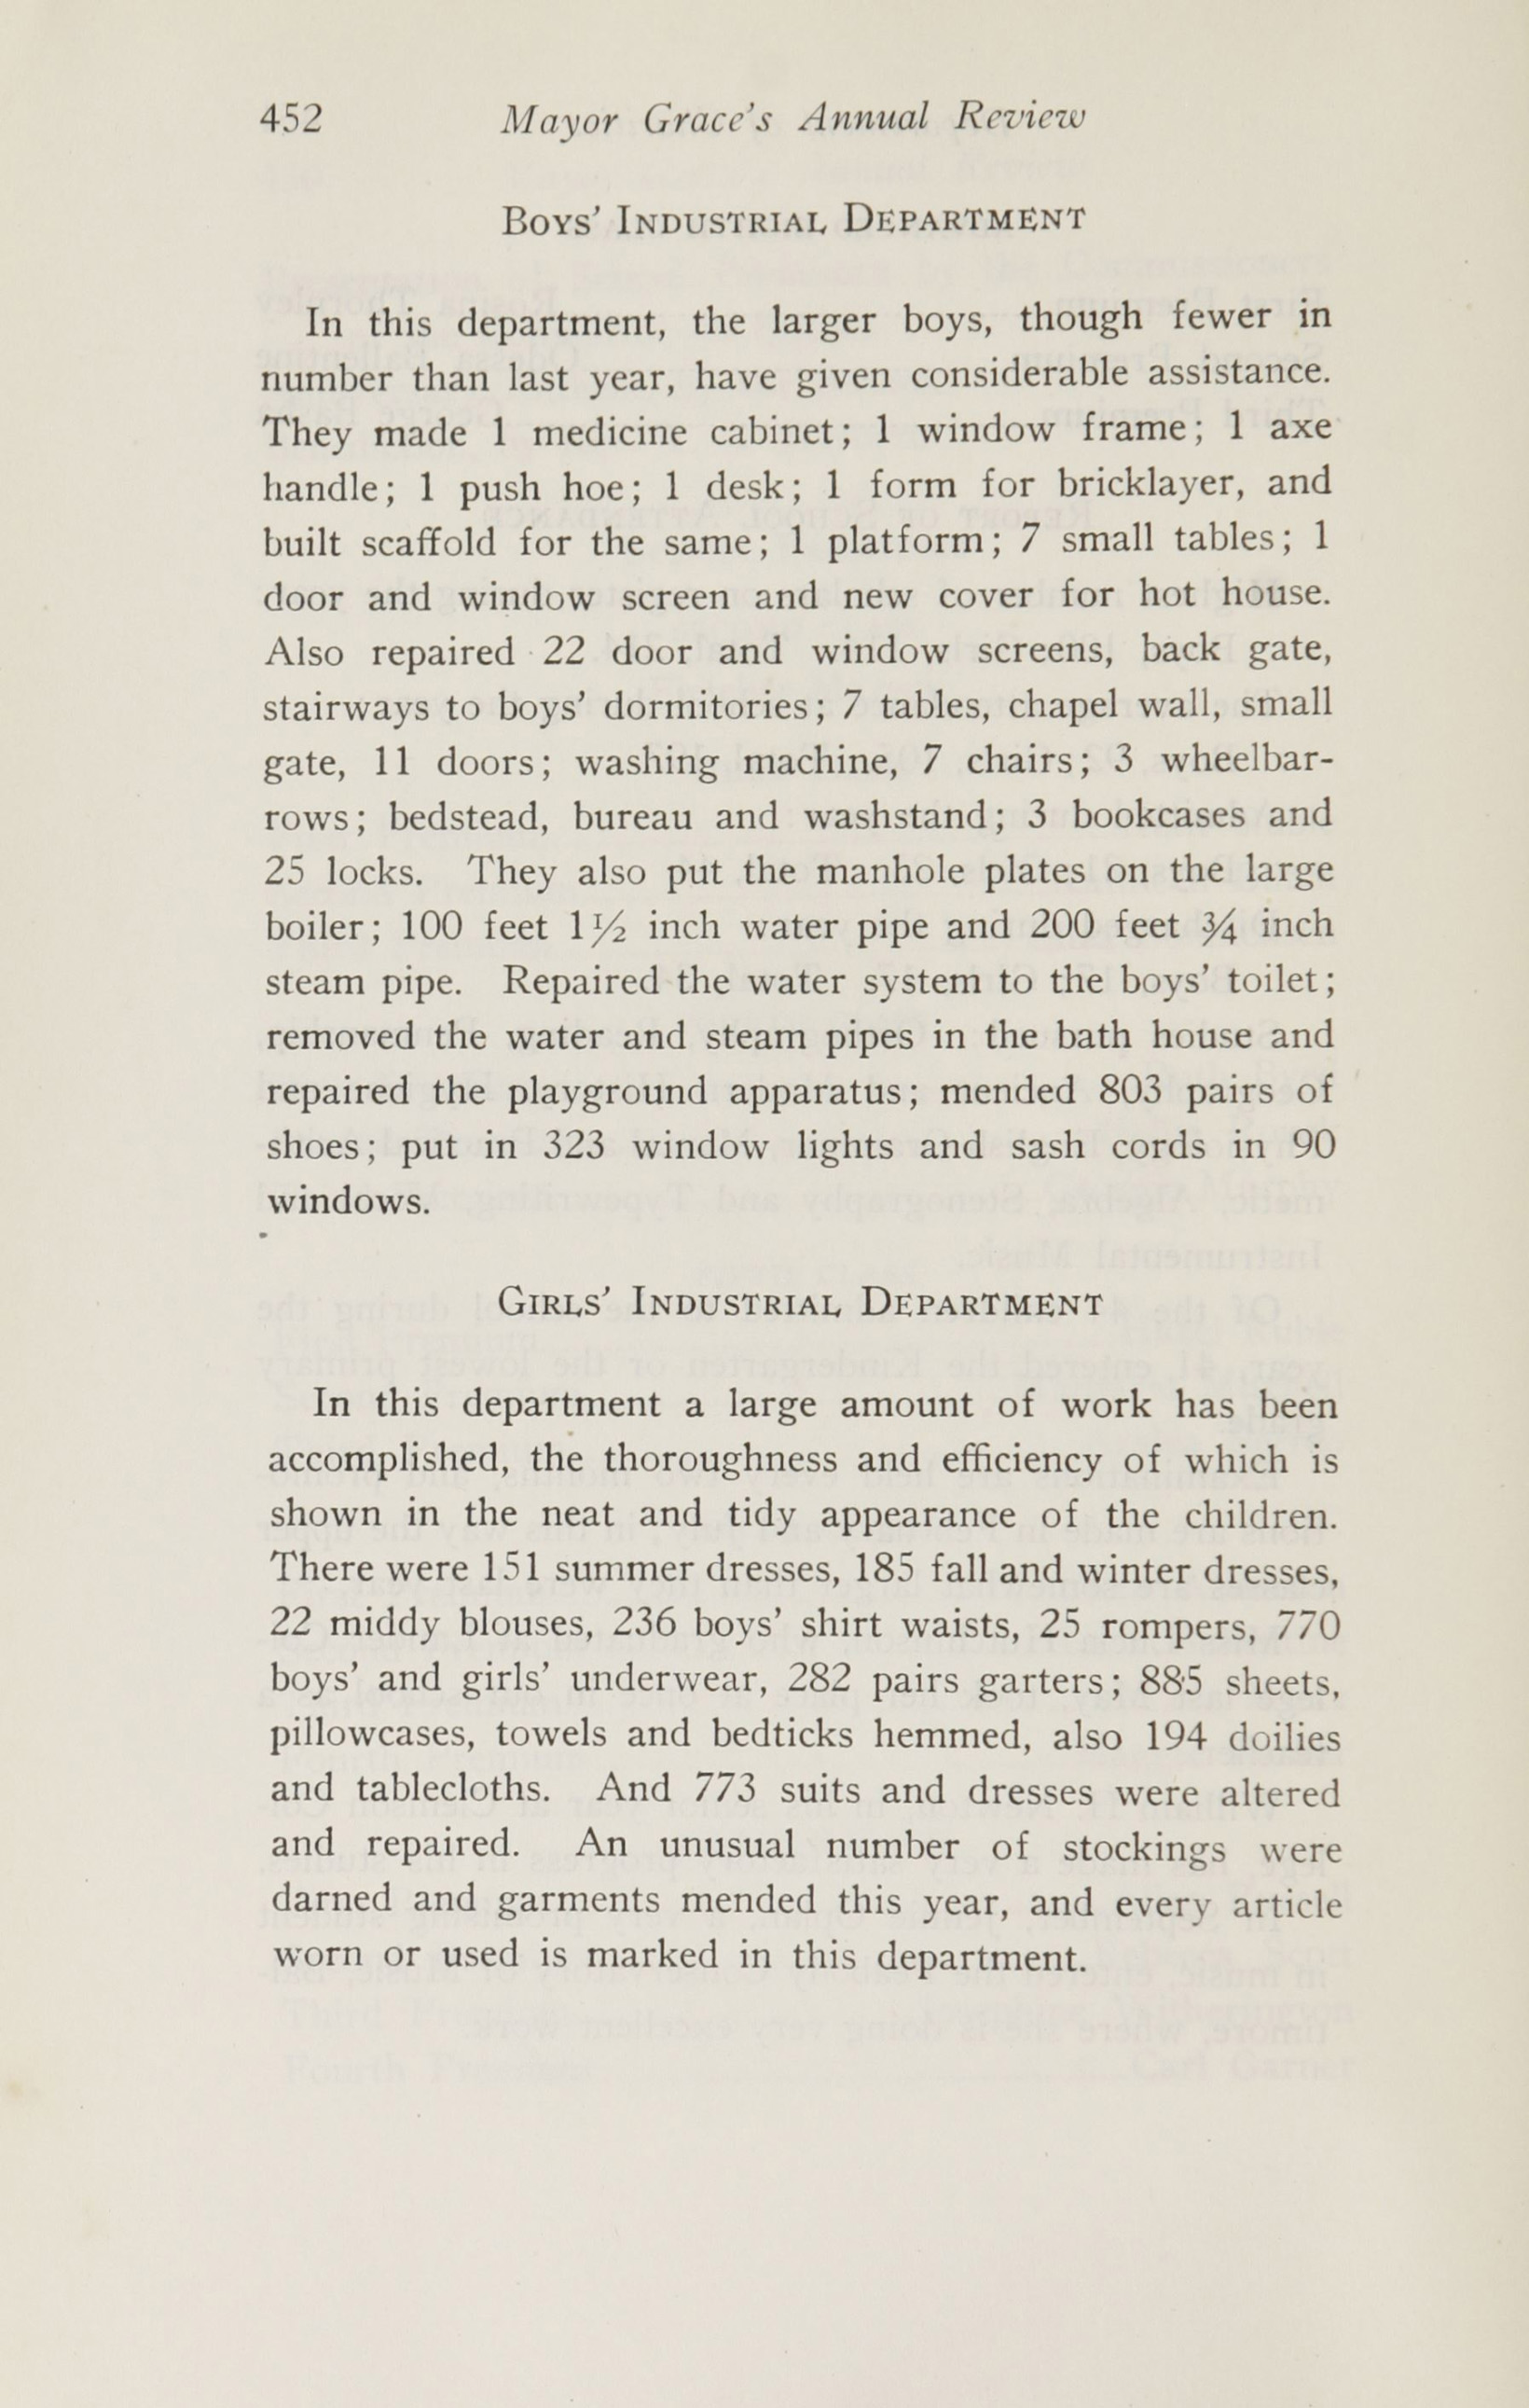 Charleston Yearbook, 1920, page 452